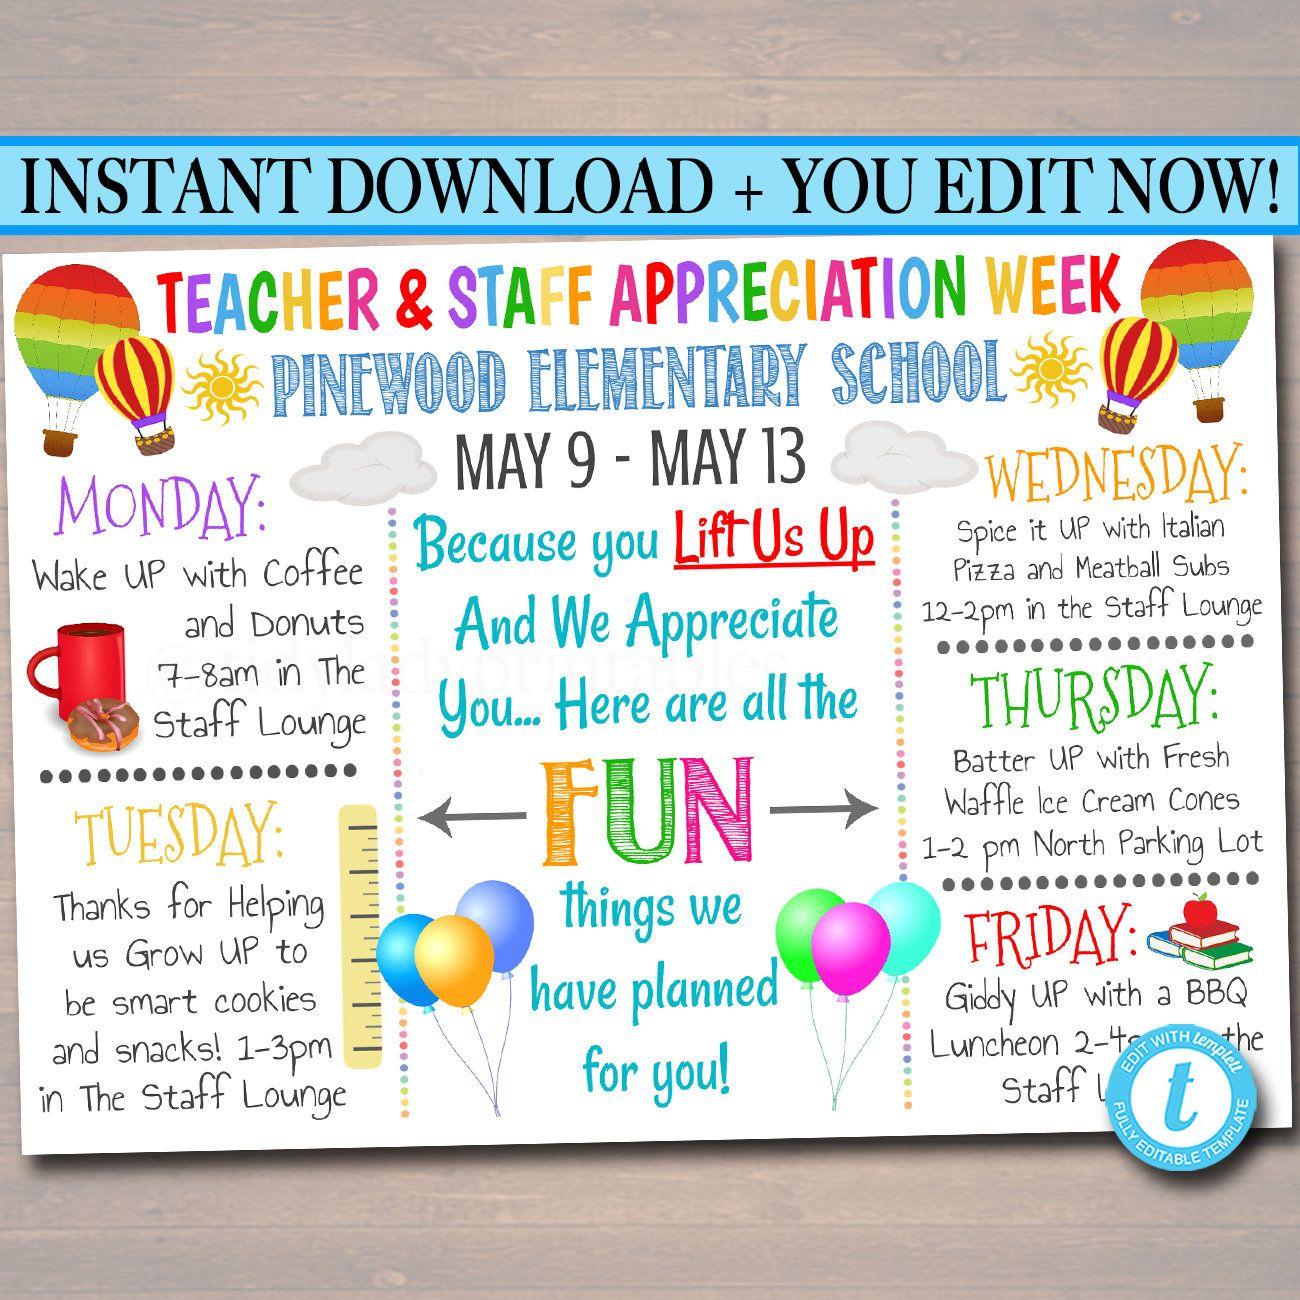 Editable Teacher Appreciation Week Itinerary Poster Digital Etsy In 2021 Teacher Appreciation Week Teacher Appreciation Staff Appreciation Week